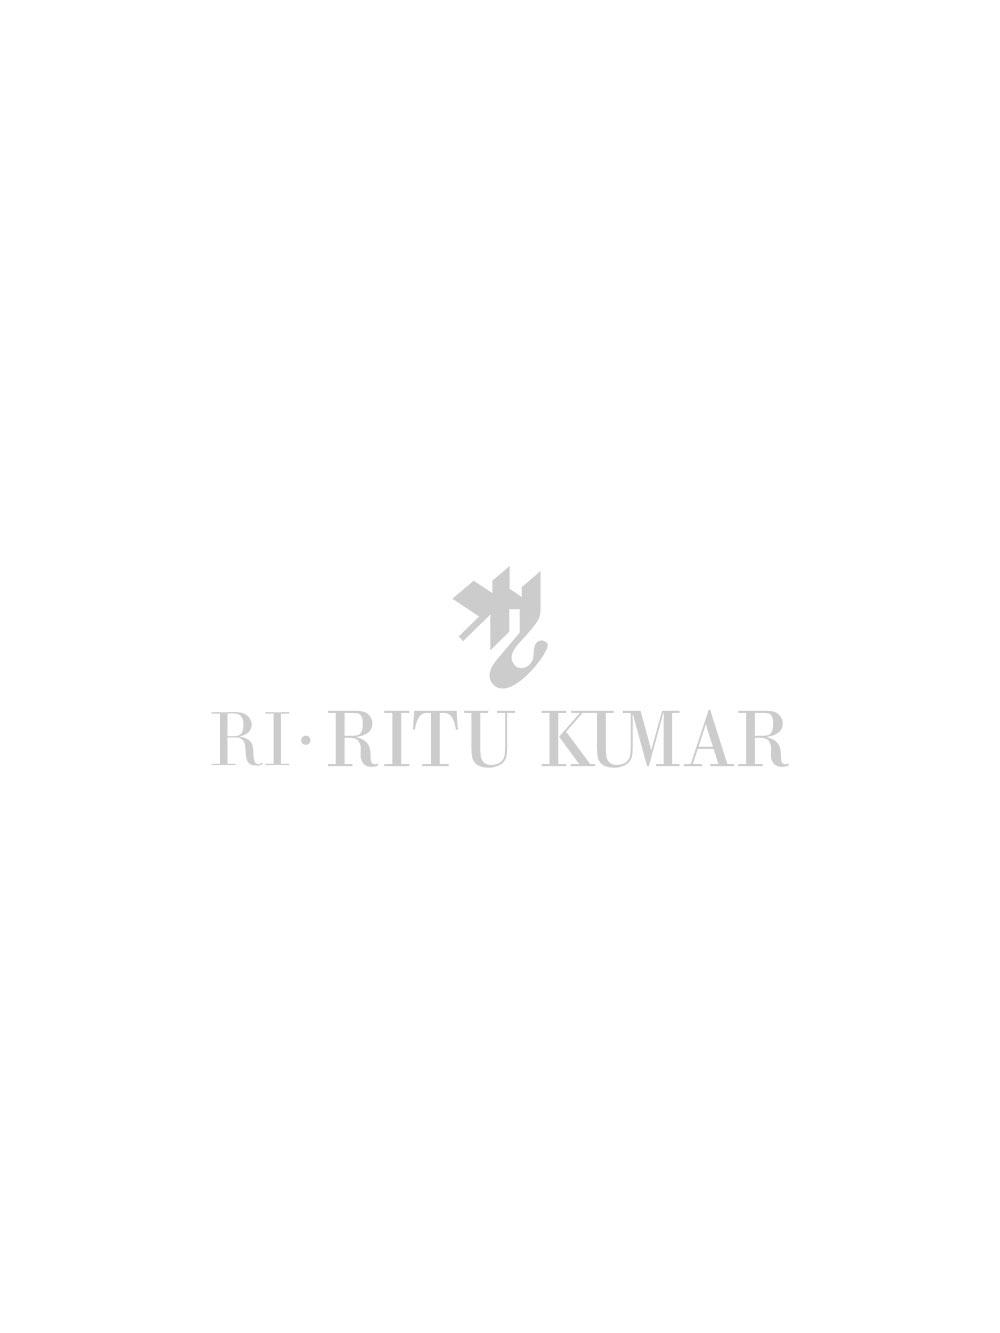 Off White & Khaki Embroidered Kurta With Dupatta And Churidar